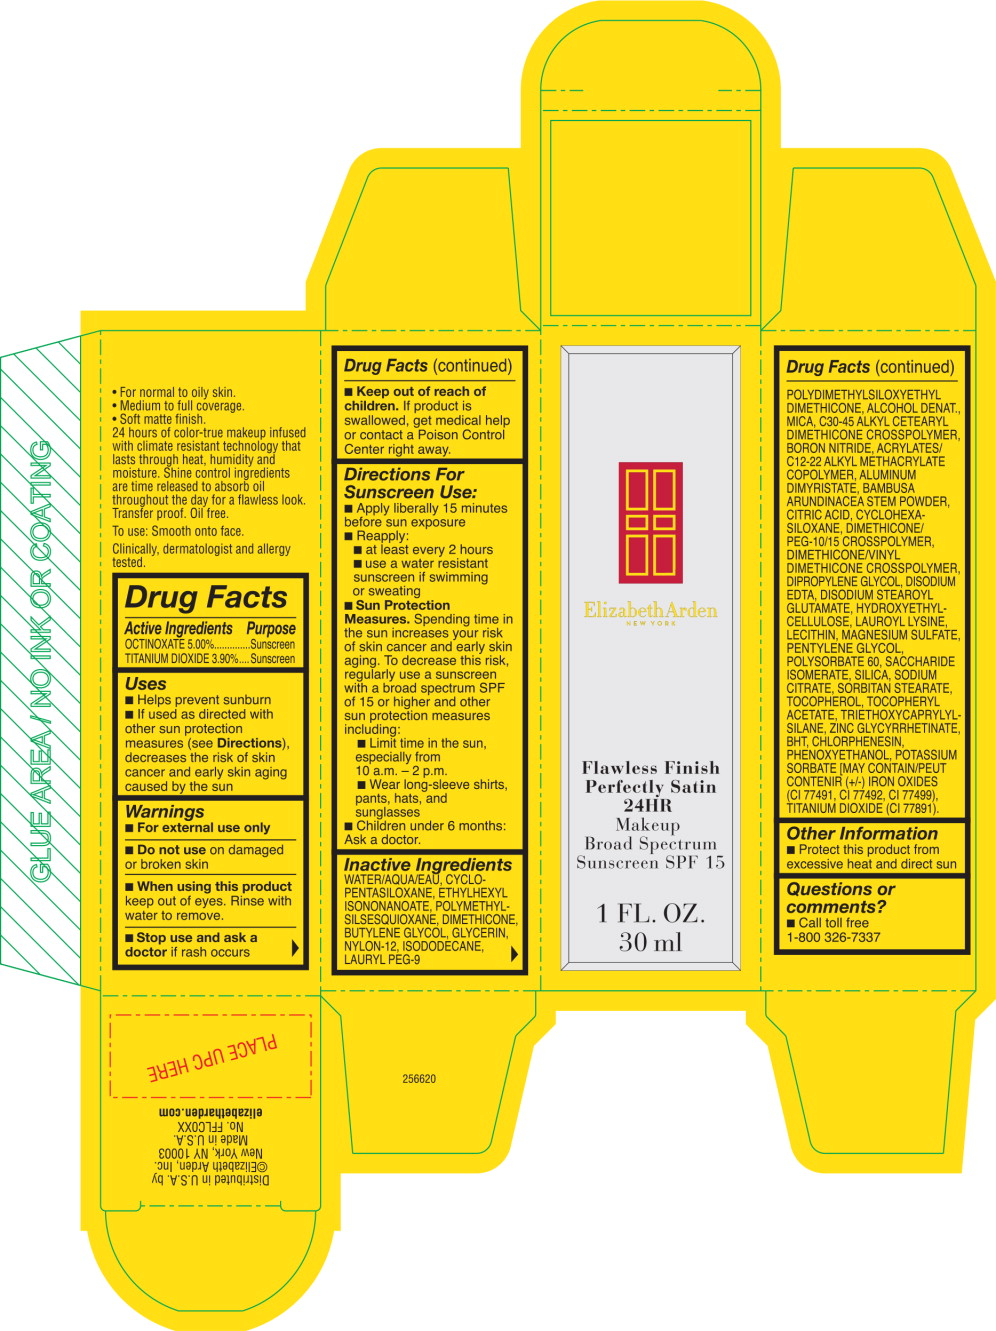 Flawless Finish Perfectly Satinb 24hr Makeup Shade Soft Tan (Octinoxate, Titanium Dioxide) Cream [Elizabeth Arden, Inc]